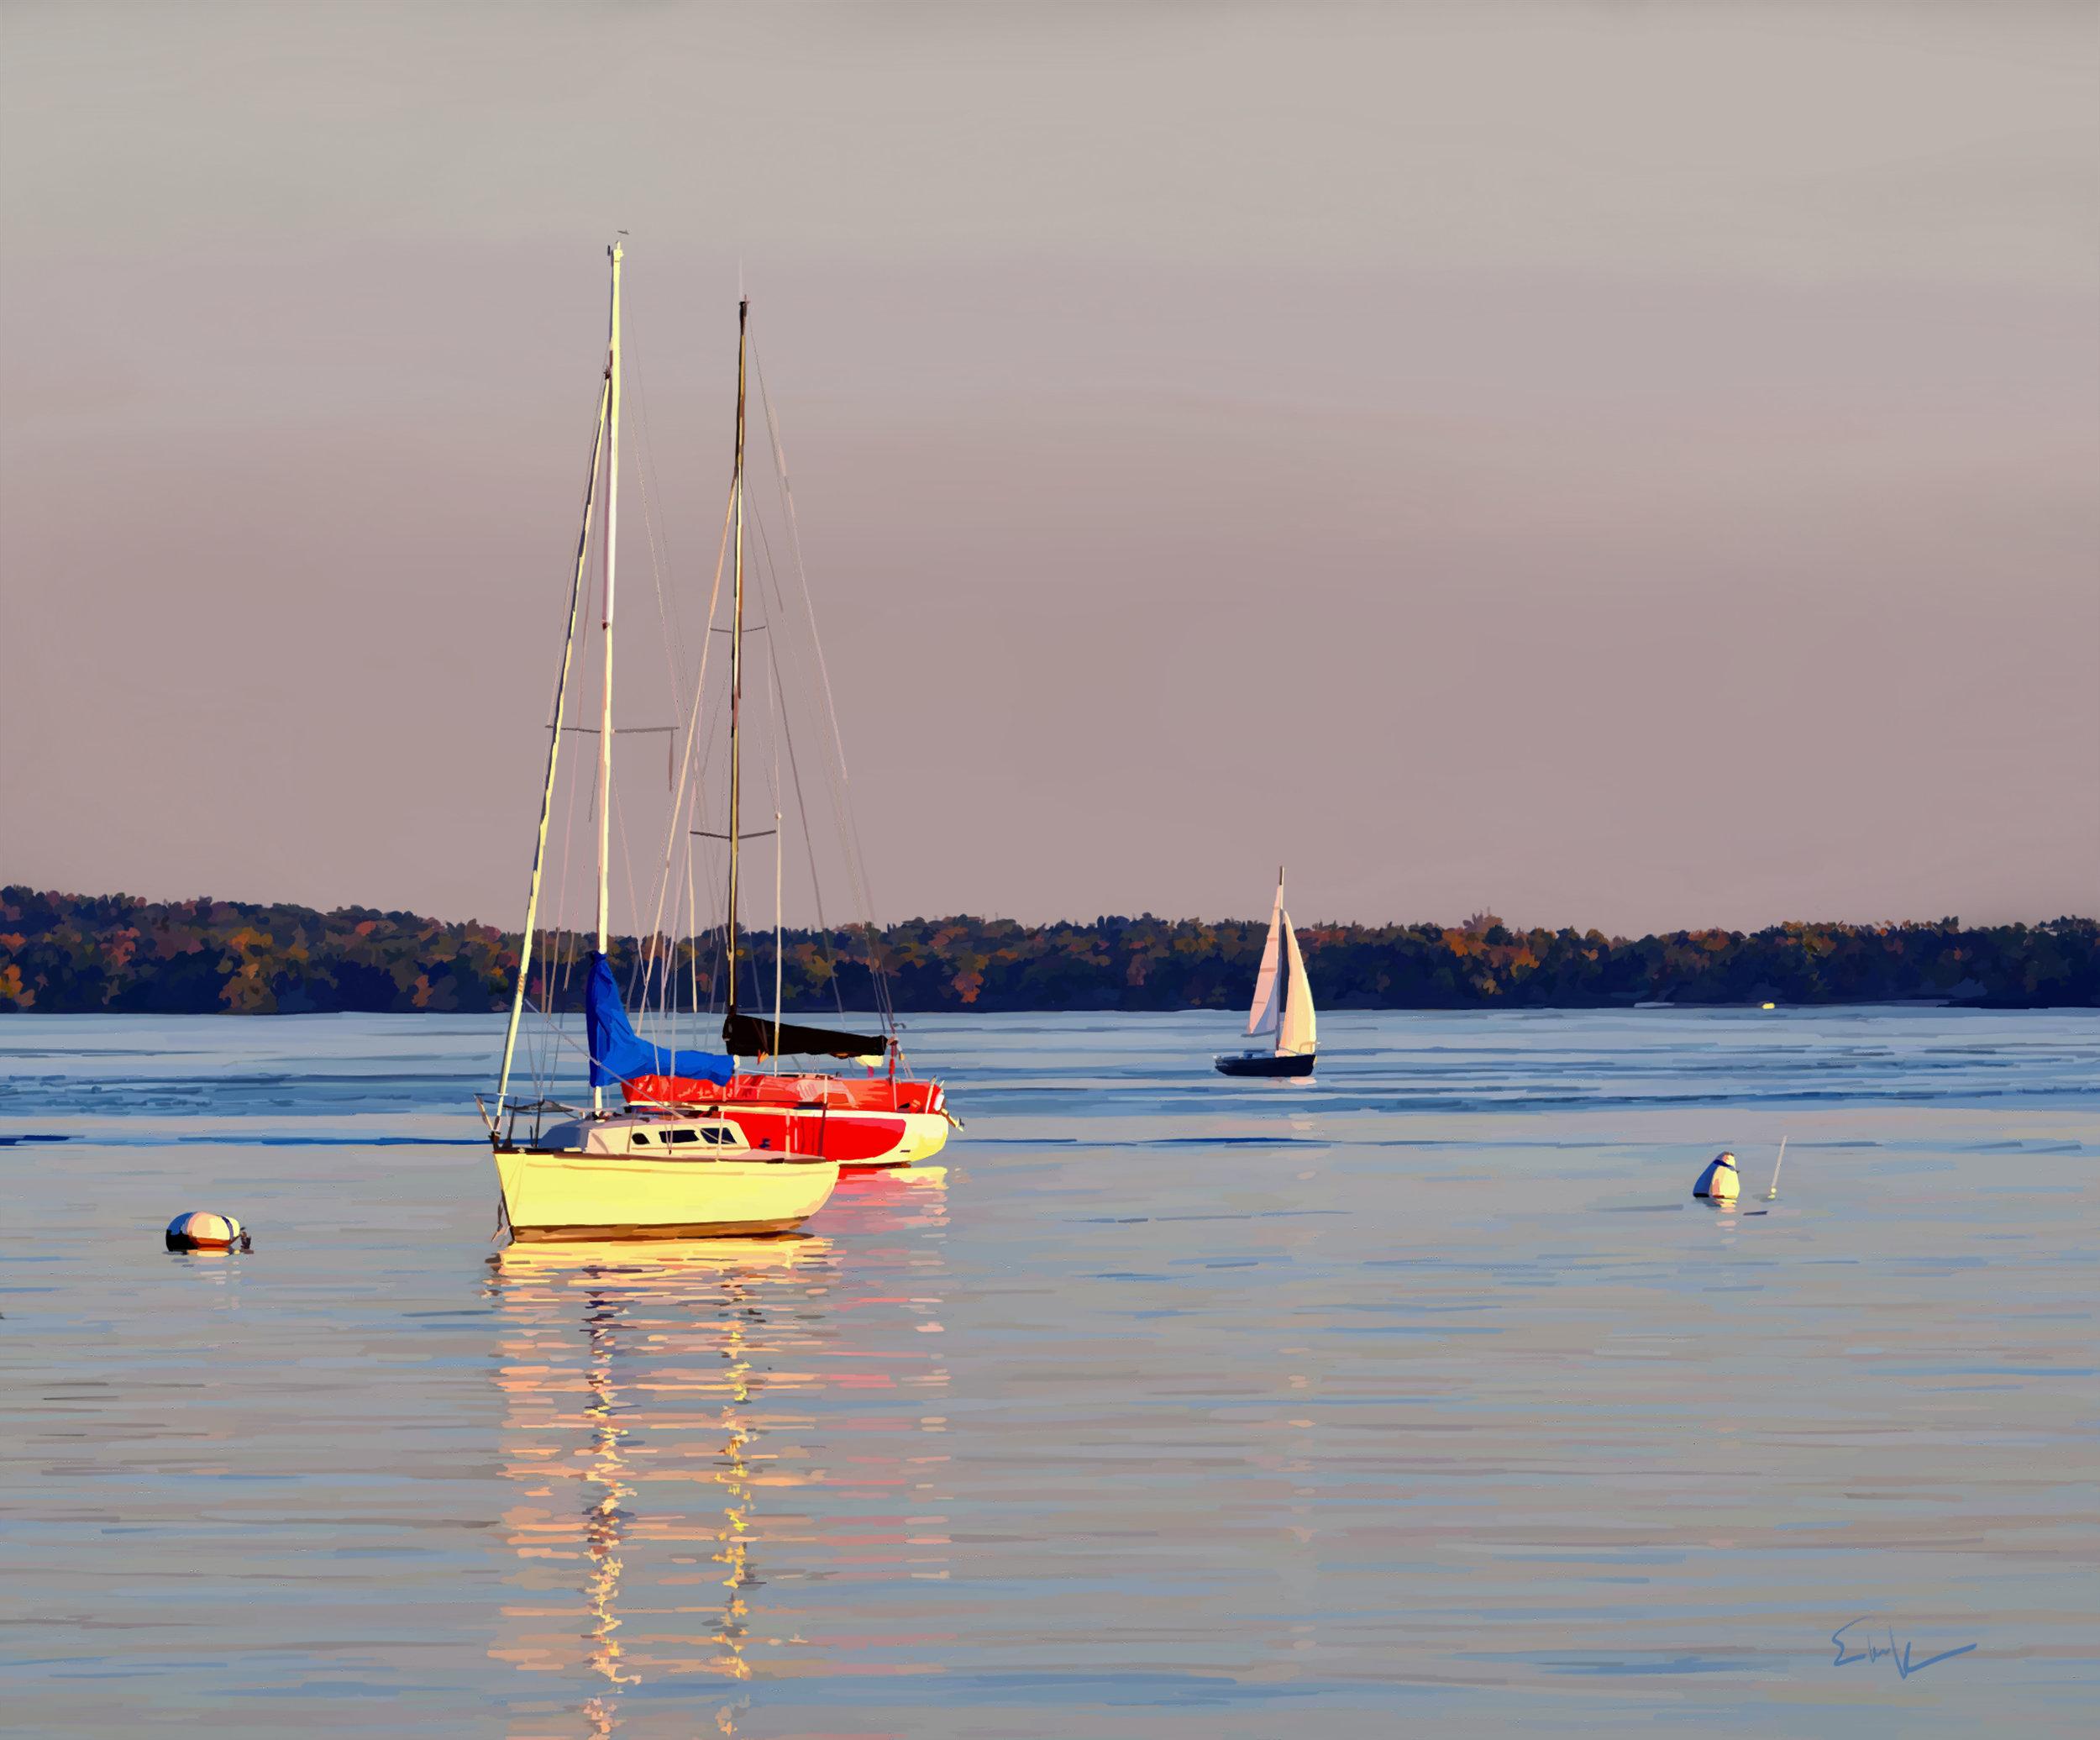 Two_Boats.jpg